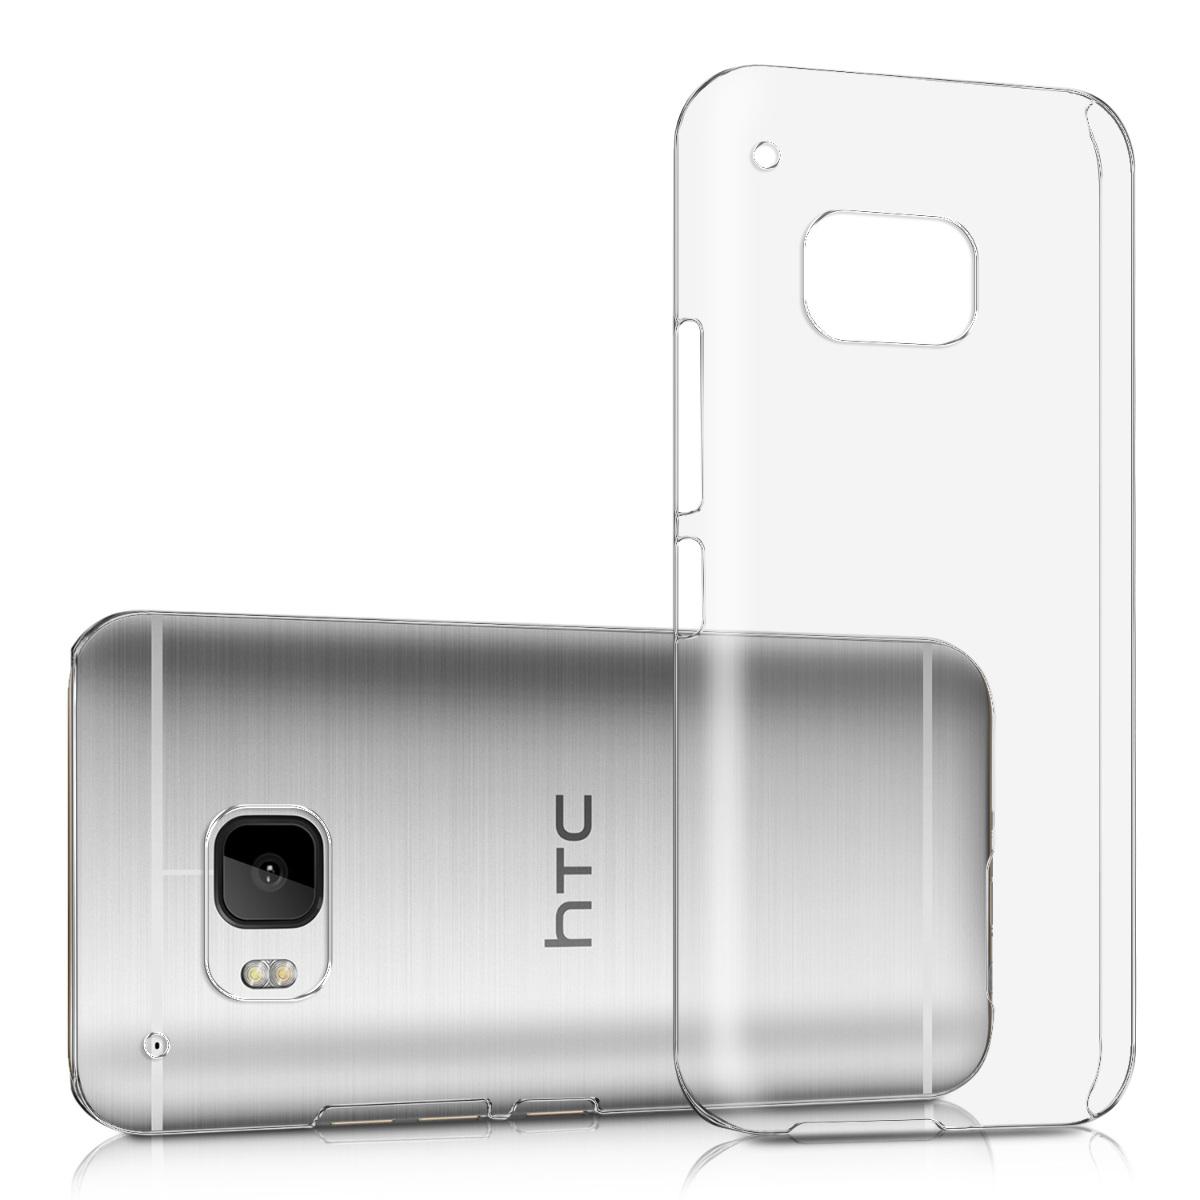 kwmobile-ETUI-ELEGANT-SOBRE-POUR-HTC-ONE-S9-HOUSSE-PROTEGE-CHOCS-ELEGANT-HOUSSE